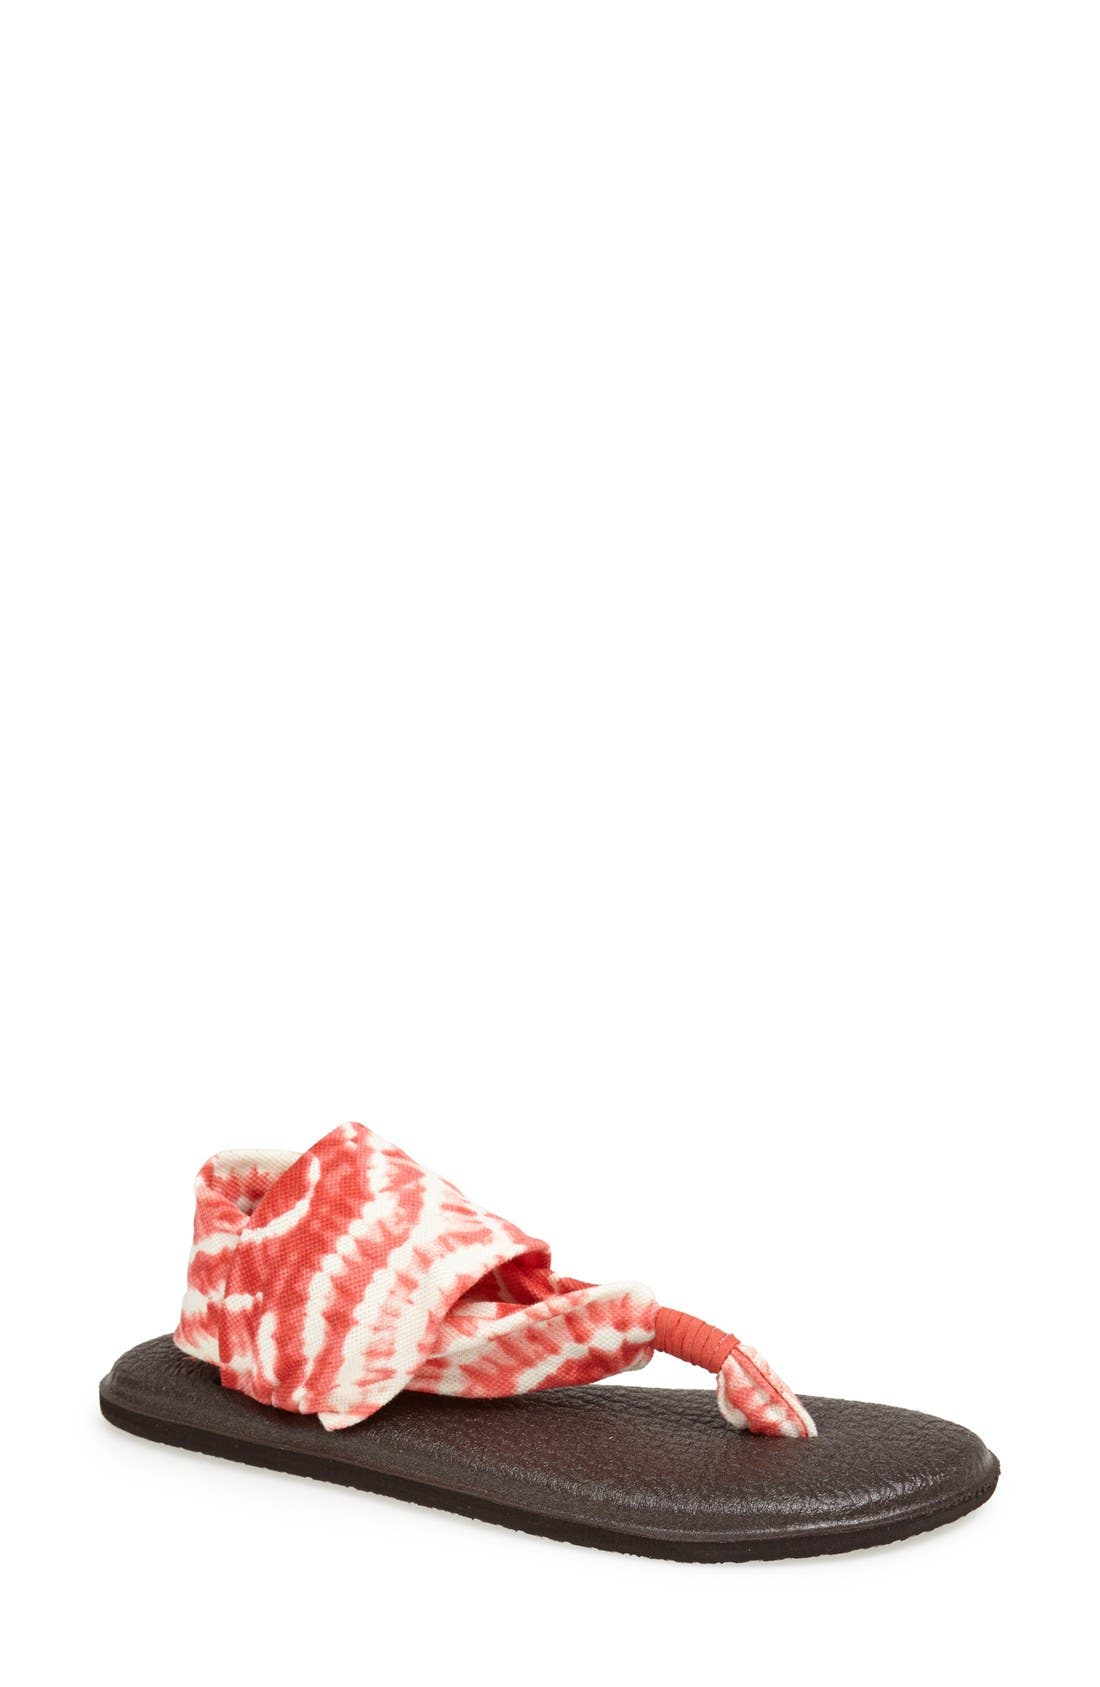 'Yoga Sling 2' Sandal,                             Main thumbnail 21, color,